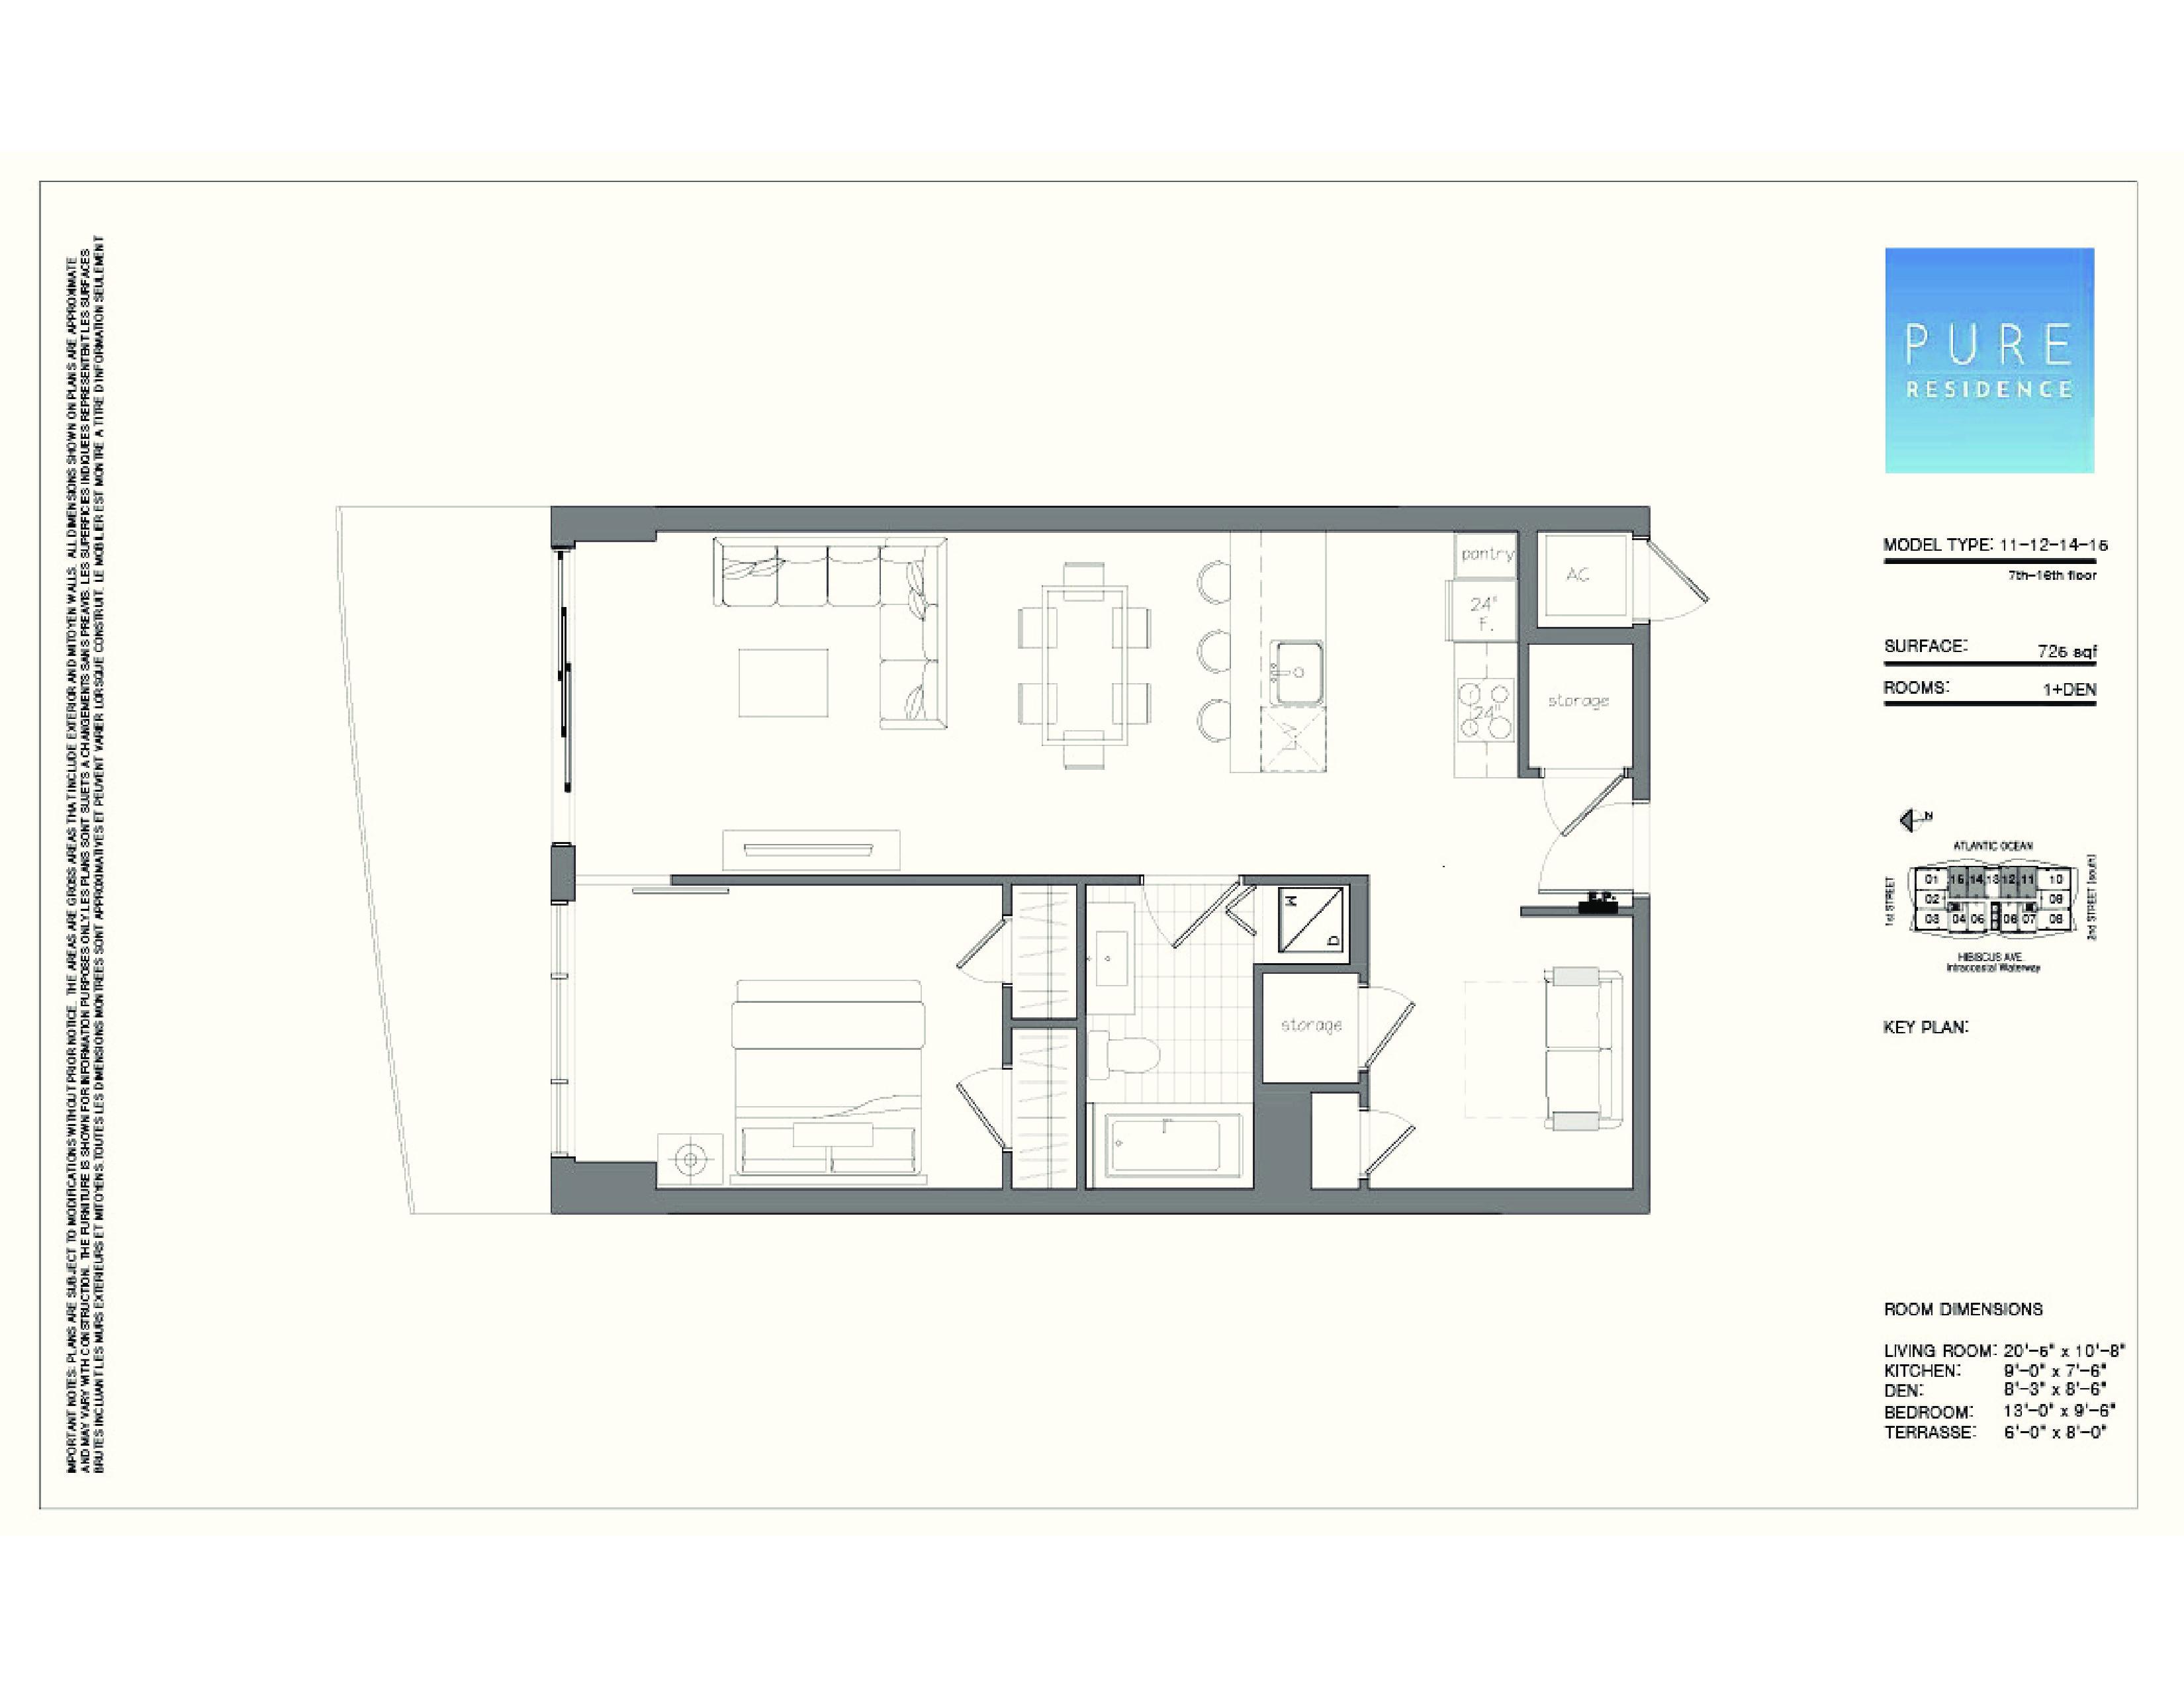 Las Olas Grand Floor Plans Pure Residence Pompano Beach